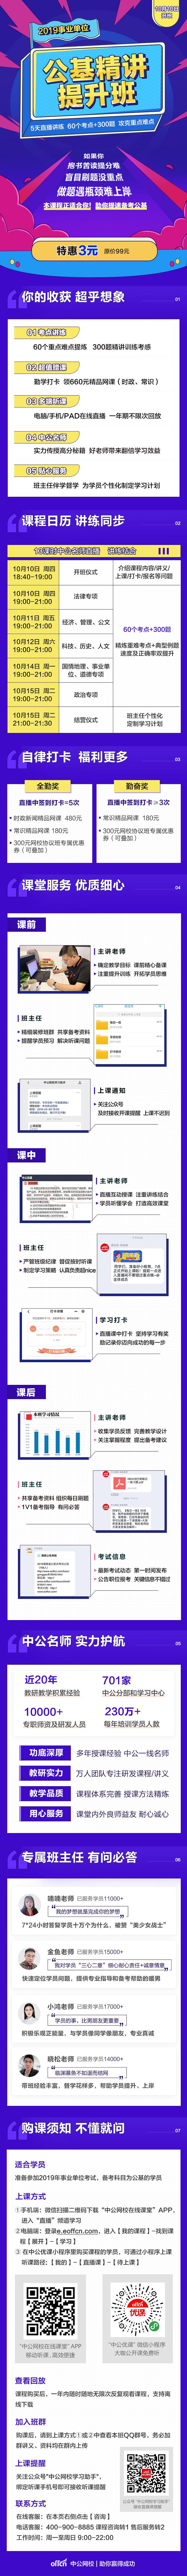 【H5-详情页】2020事业单位-公精讲拔高班.jpg